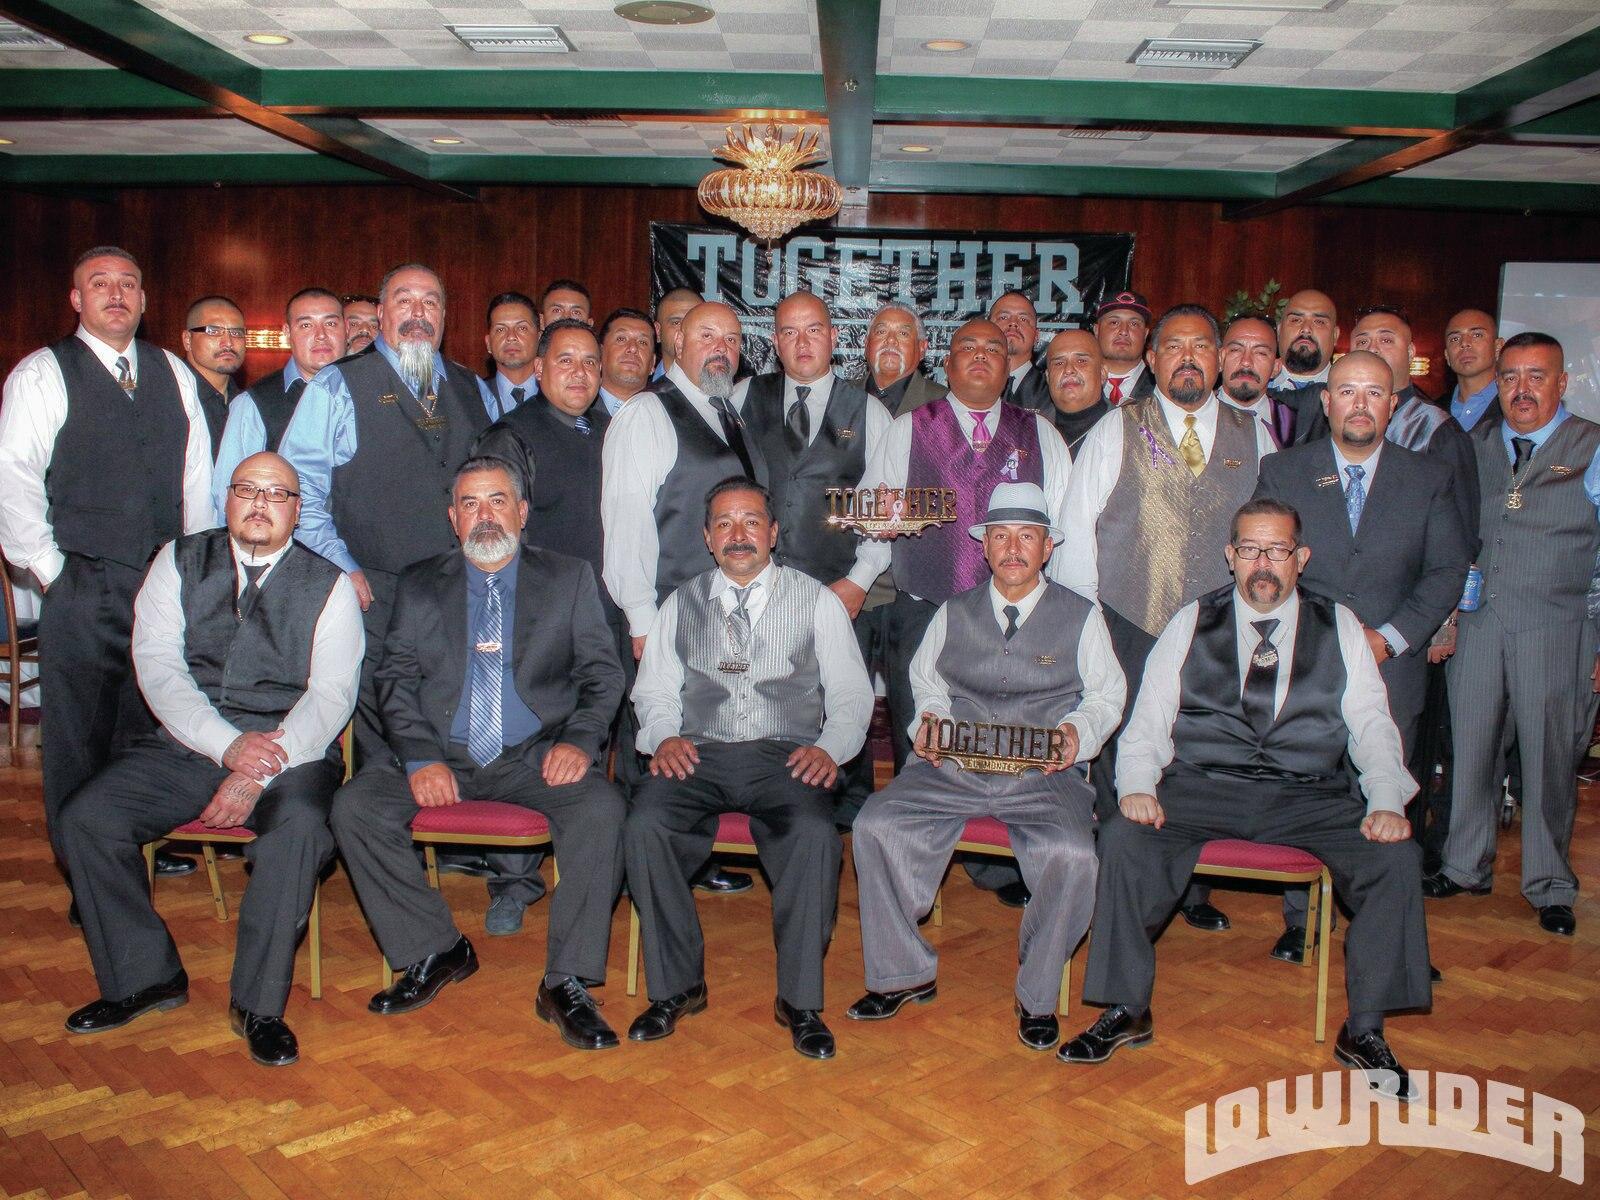 together-car-club-35th-anniversary-club-members-group-shot-21